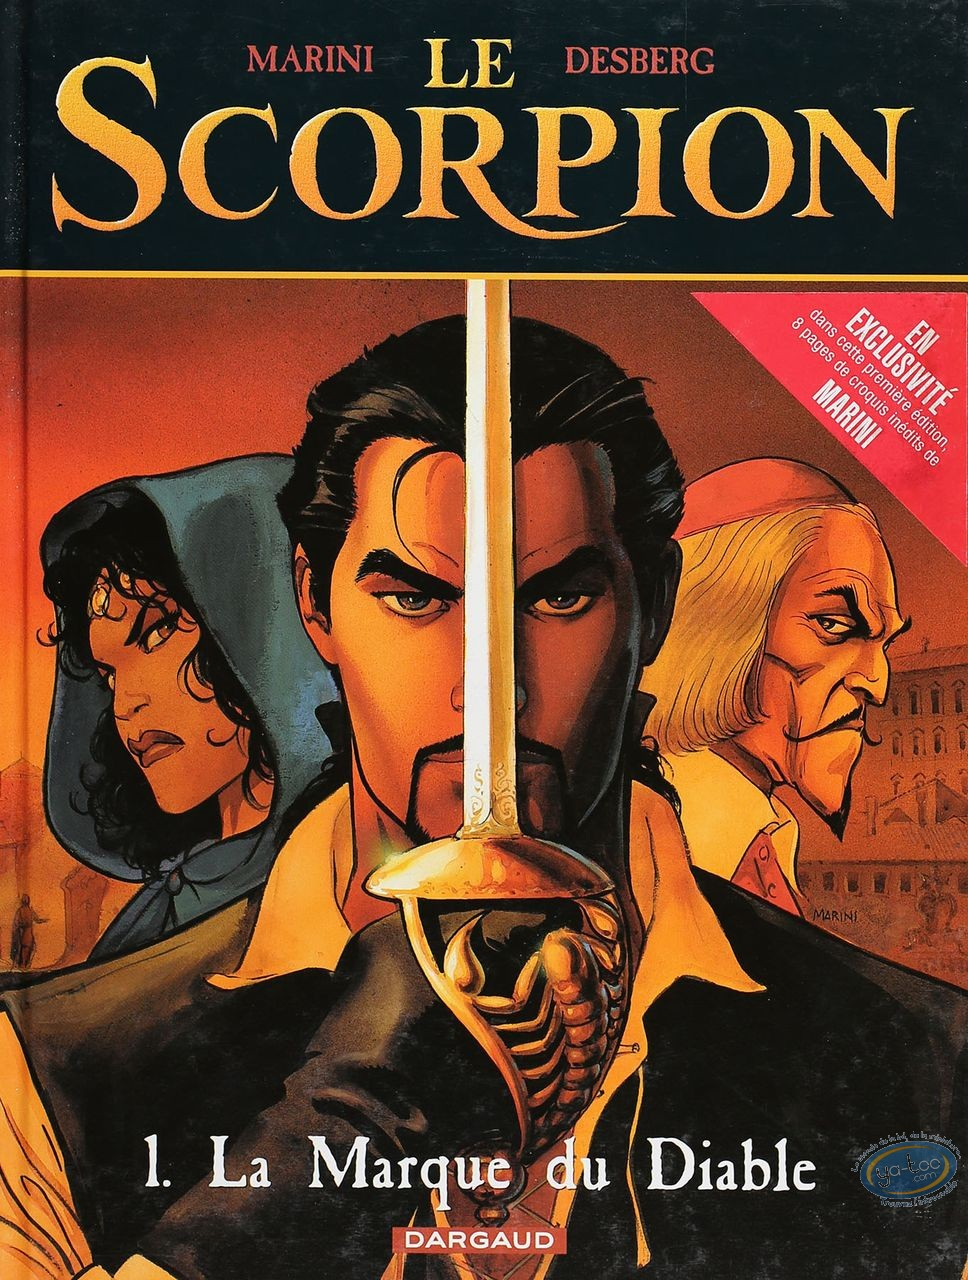 Listed European Comic Books, Scorpion (Le) : La Marque du Diable (very good condition)